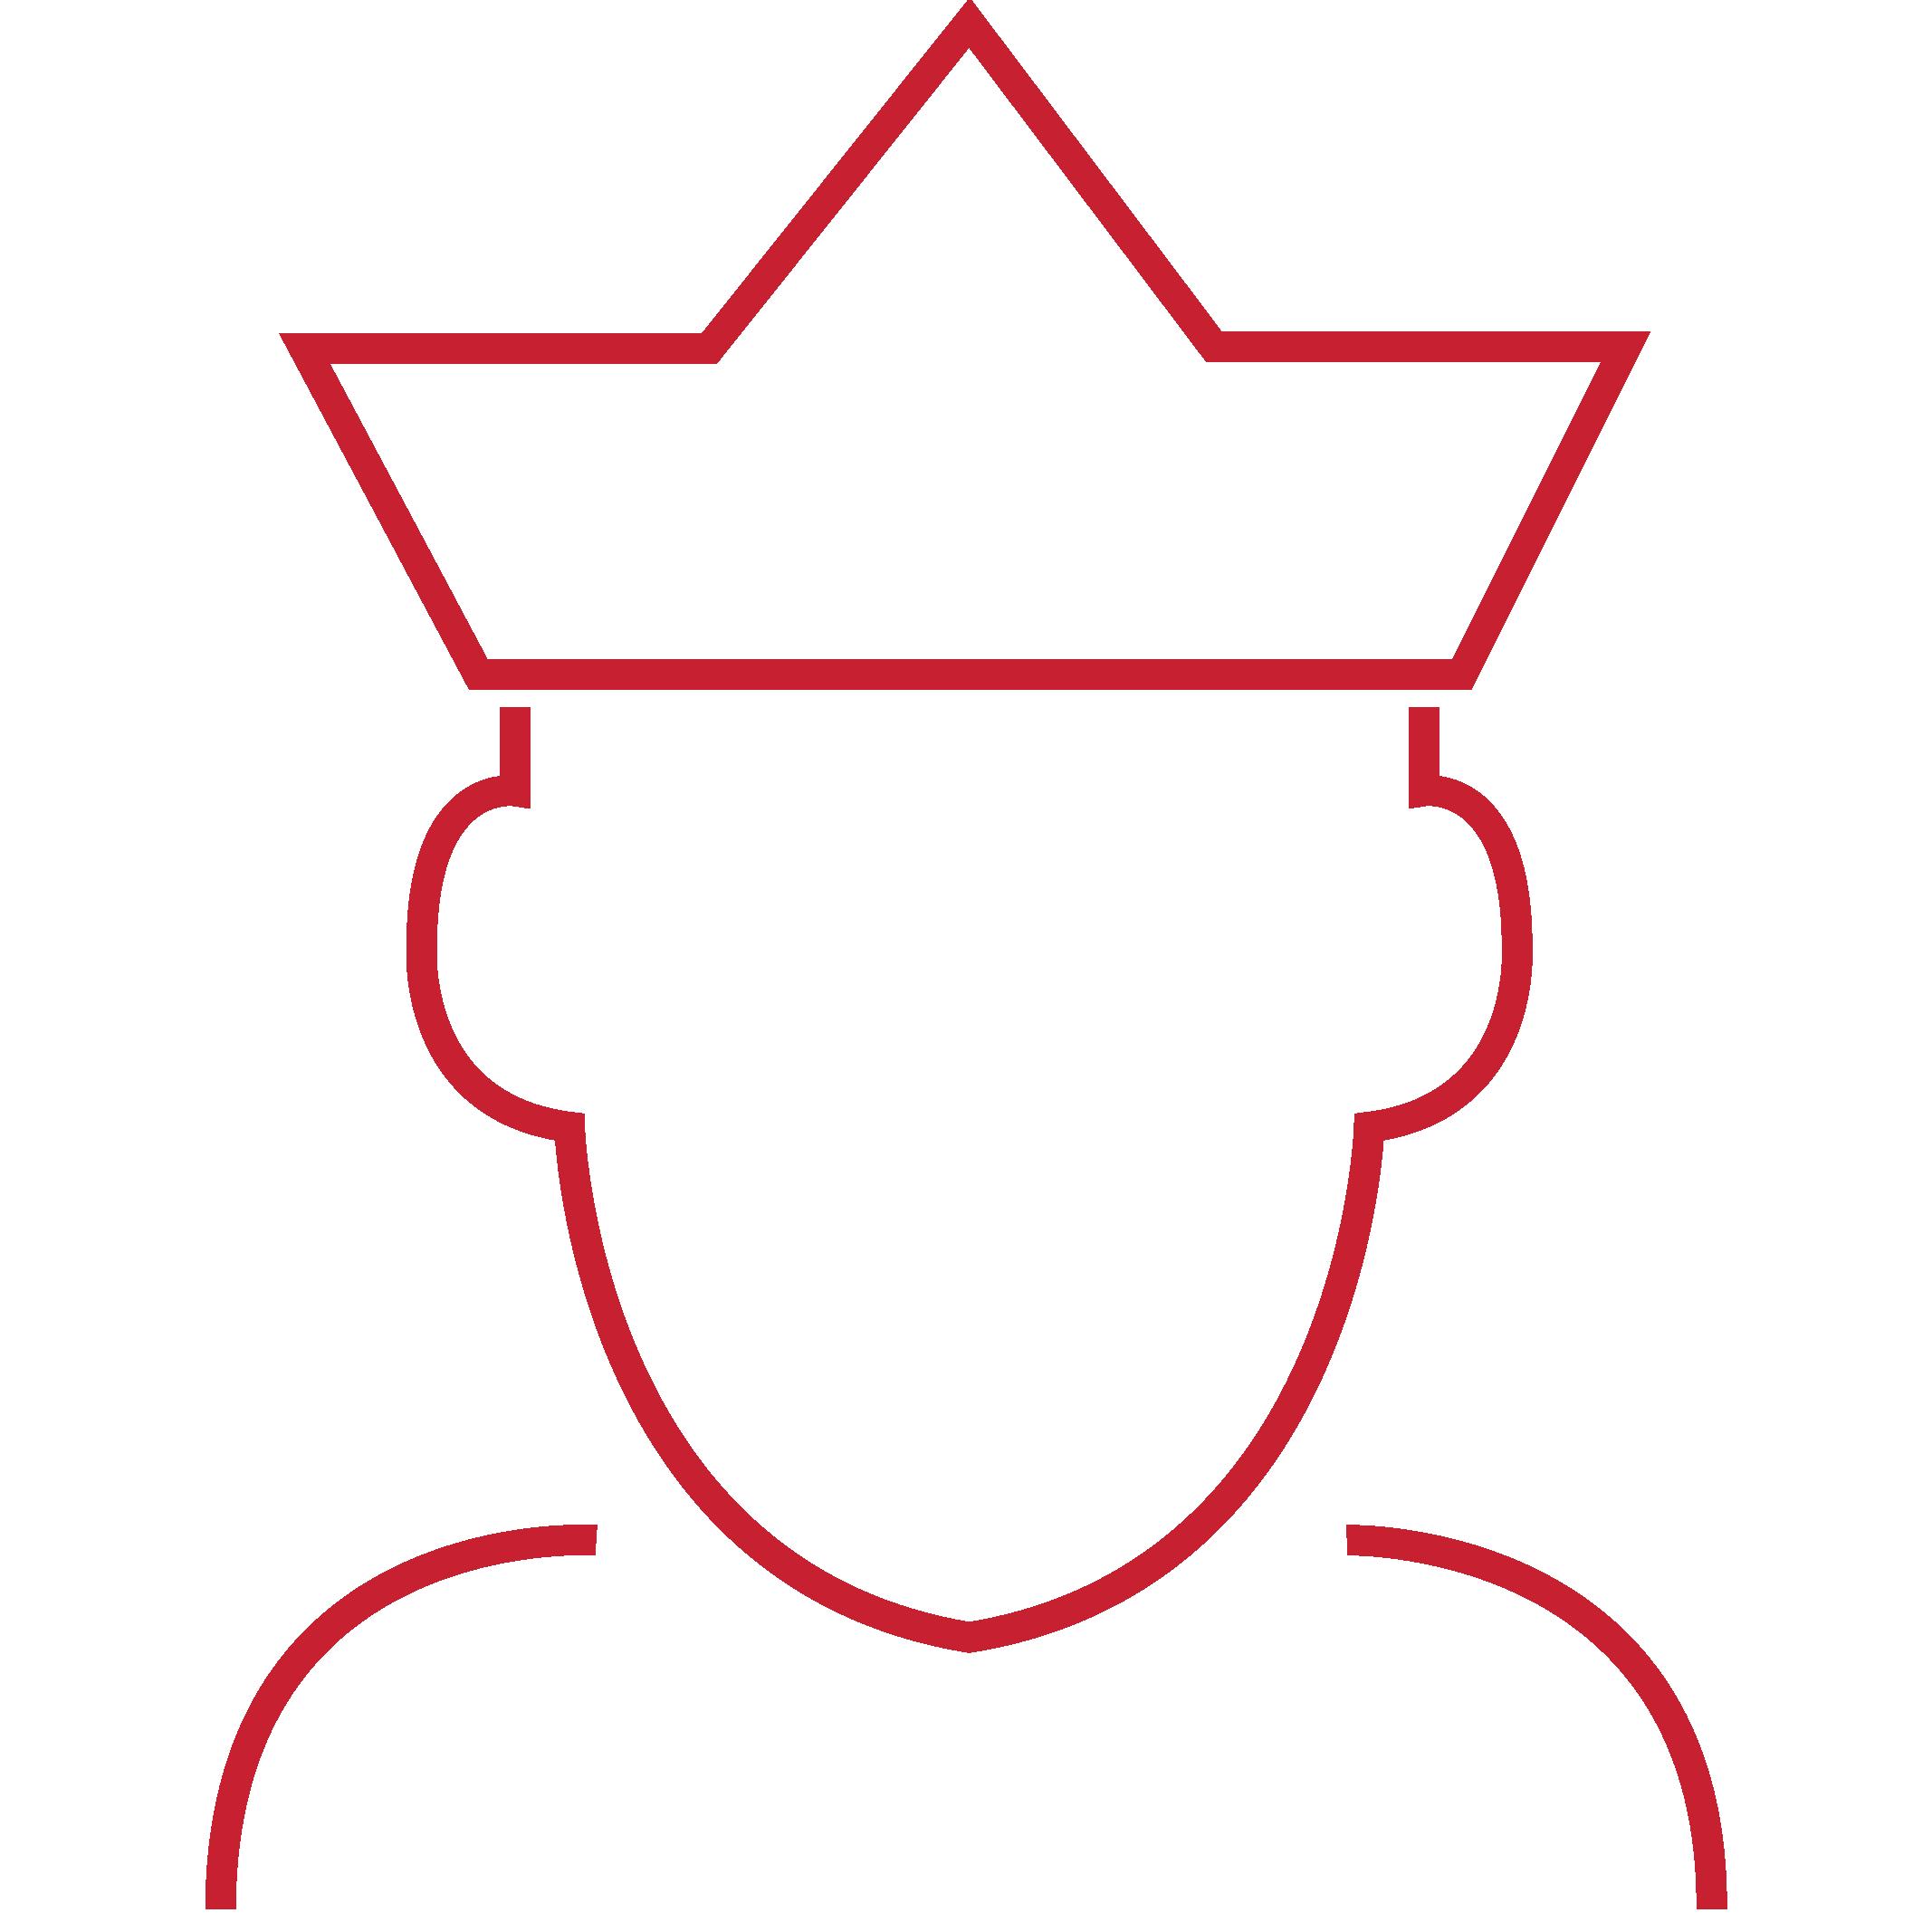 Kingster's Principle